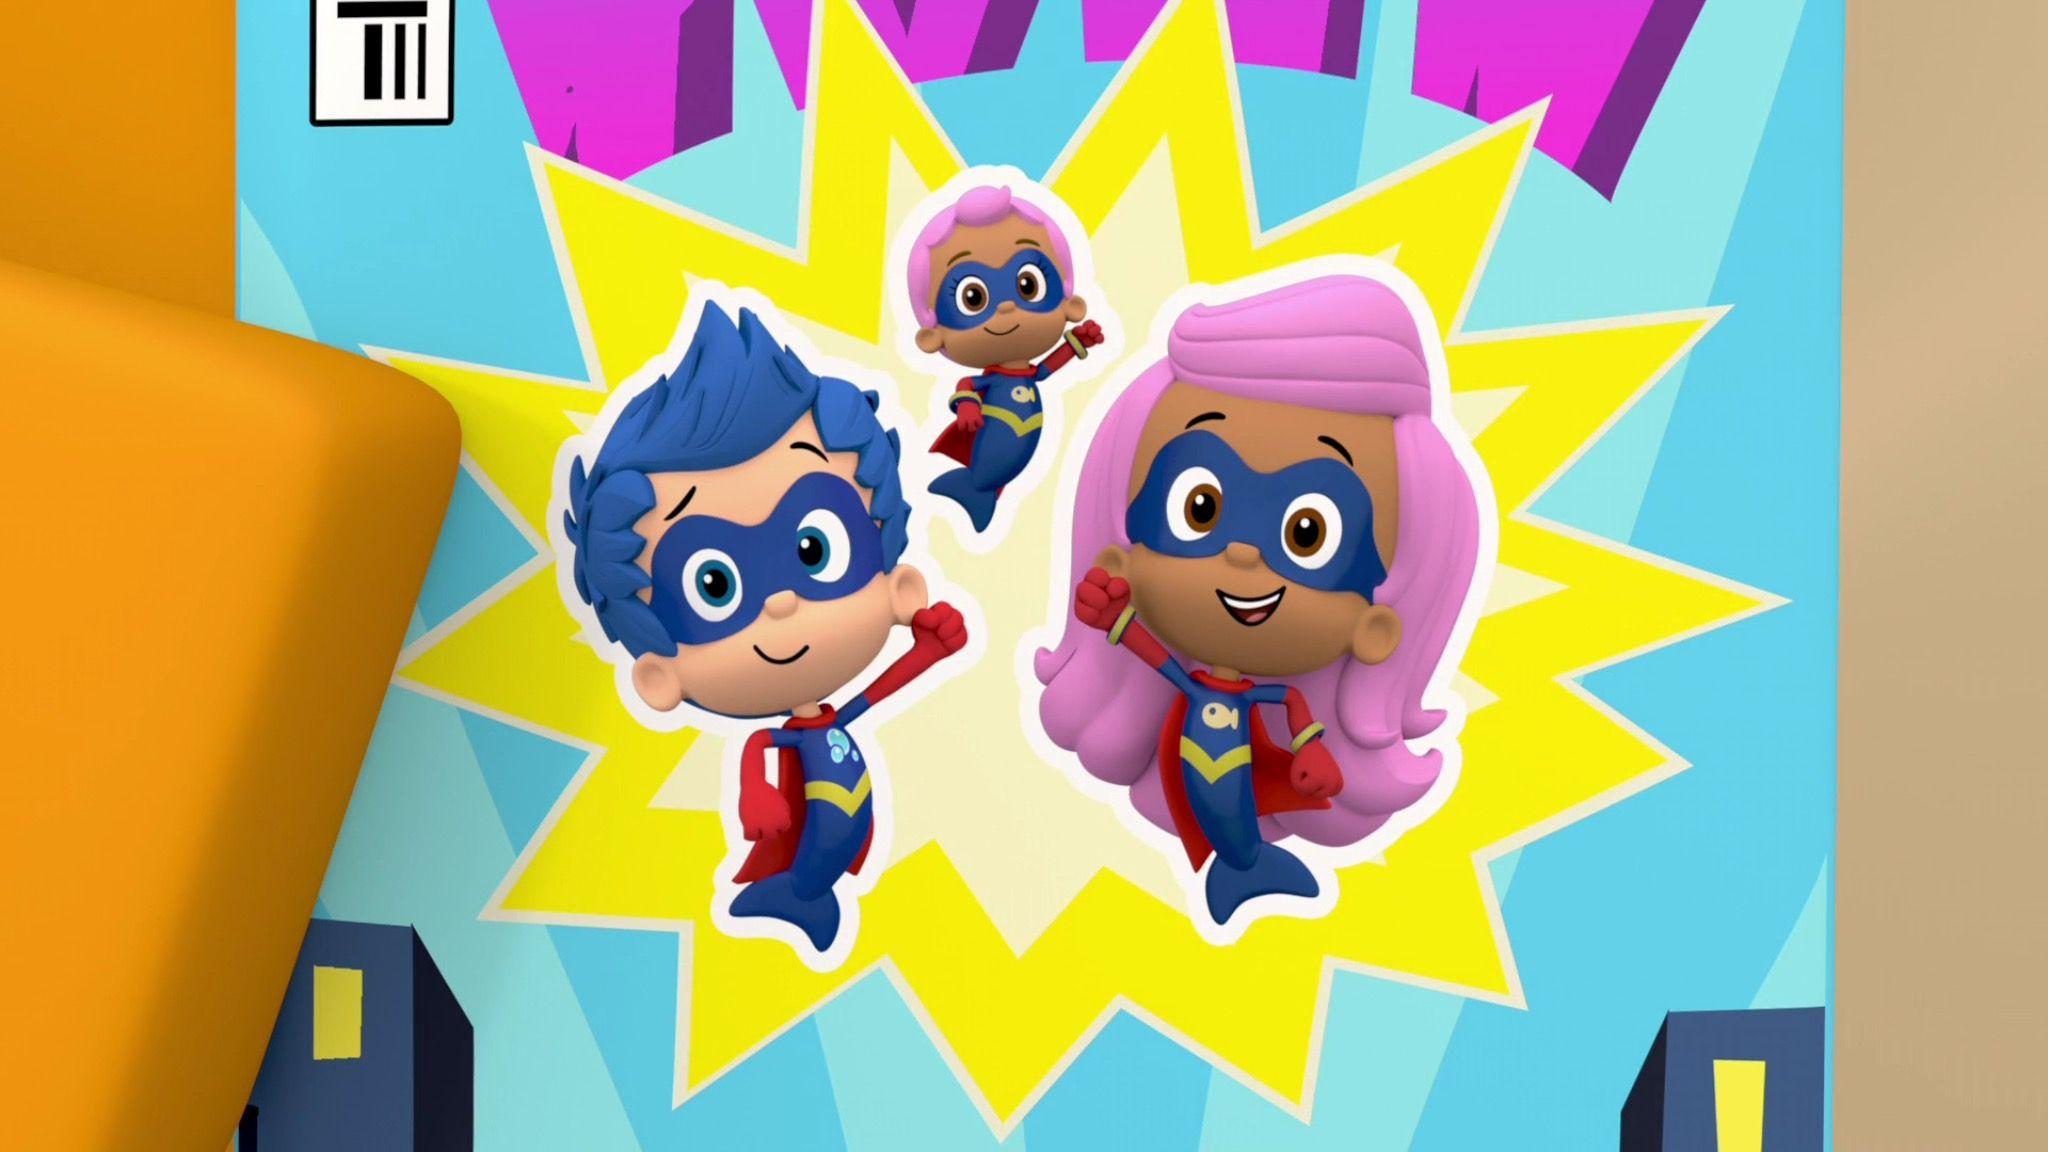 Bubble Guppies Super Baby Comic Book In 2020 Bubble Boy Super Adventure Nick Jr